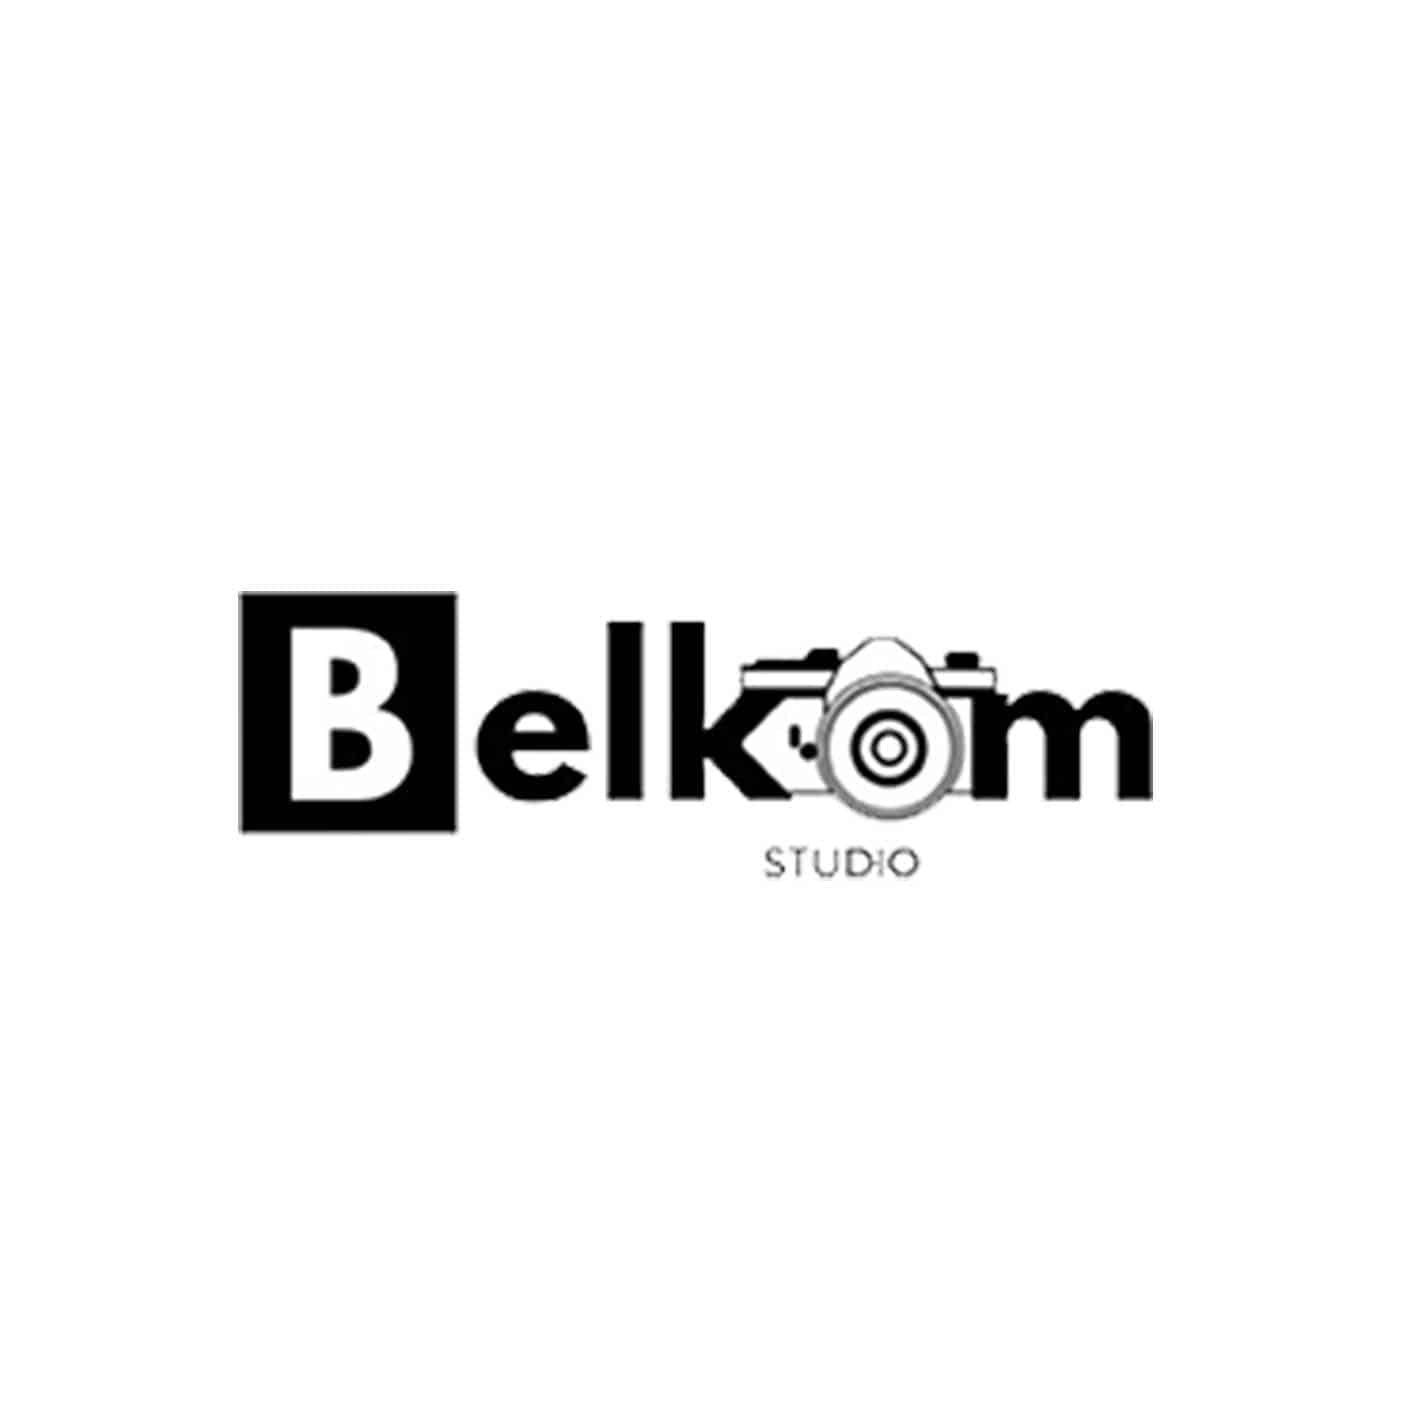 belkom-logo-1964-communication